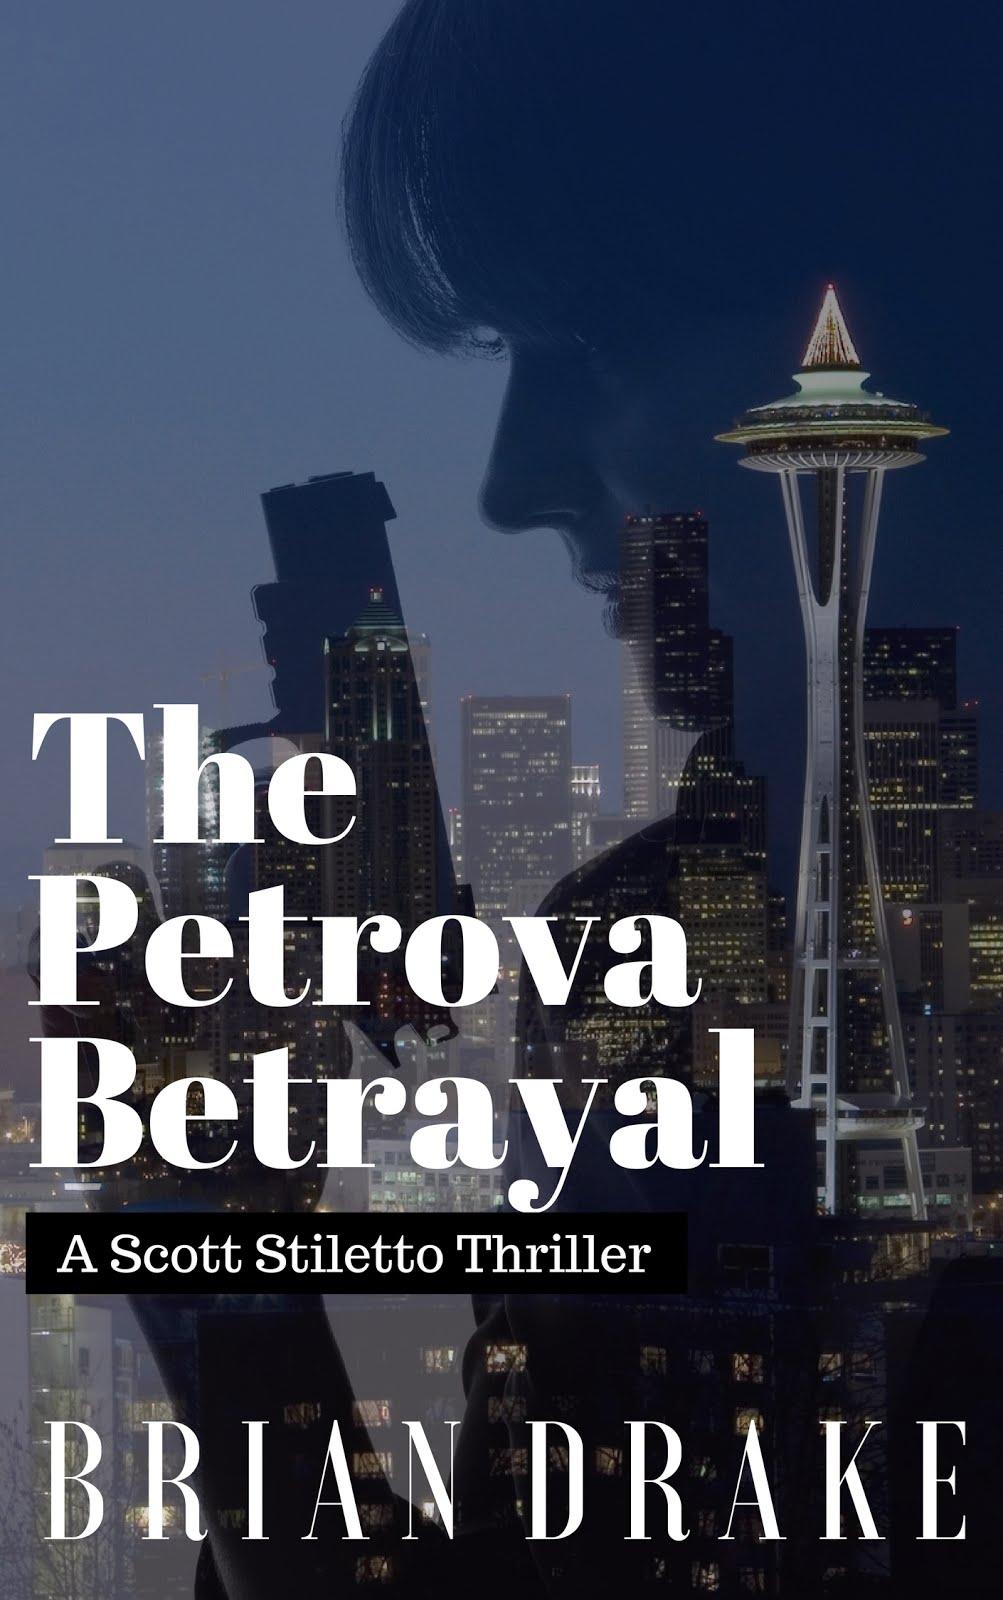 The Petrova Betrayal: A Scott Stiletto Thriller